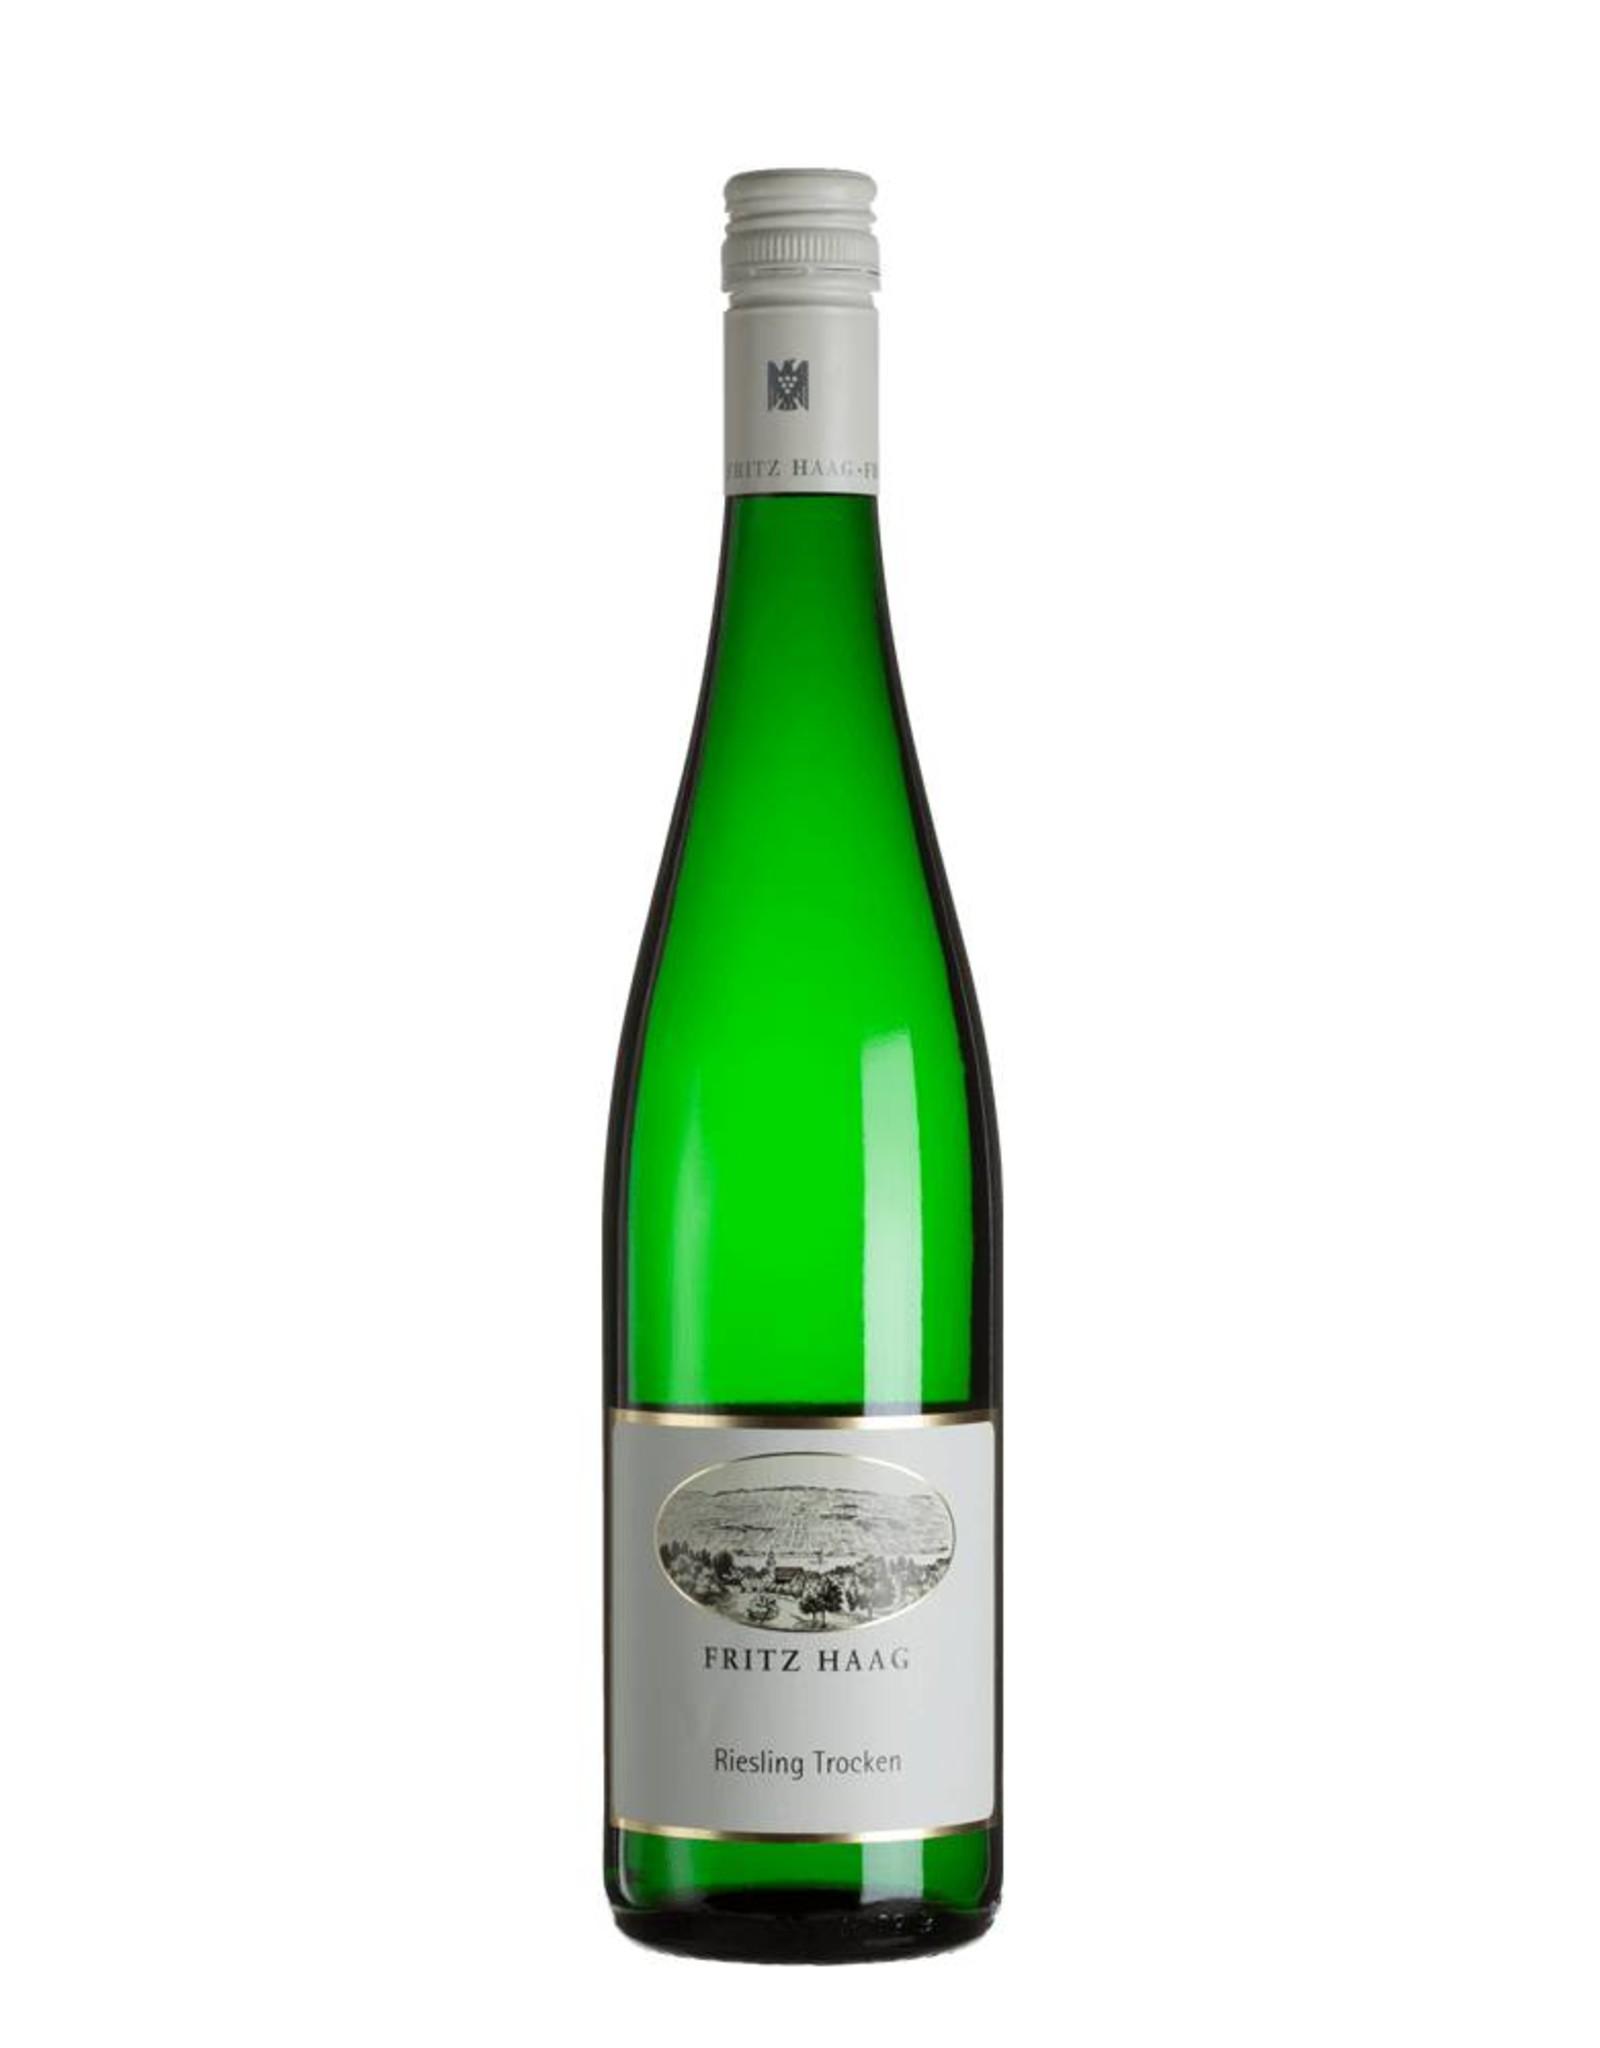 Weingut Fritz Haag Riesling Trocken